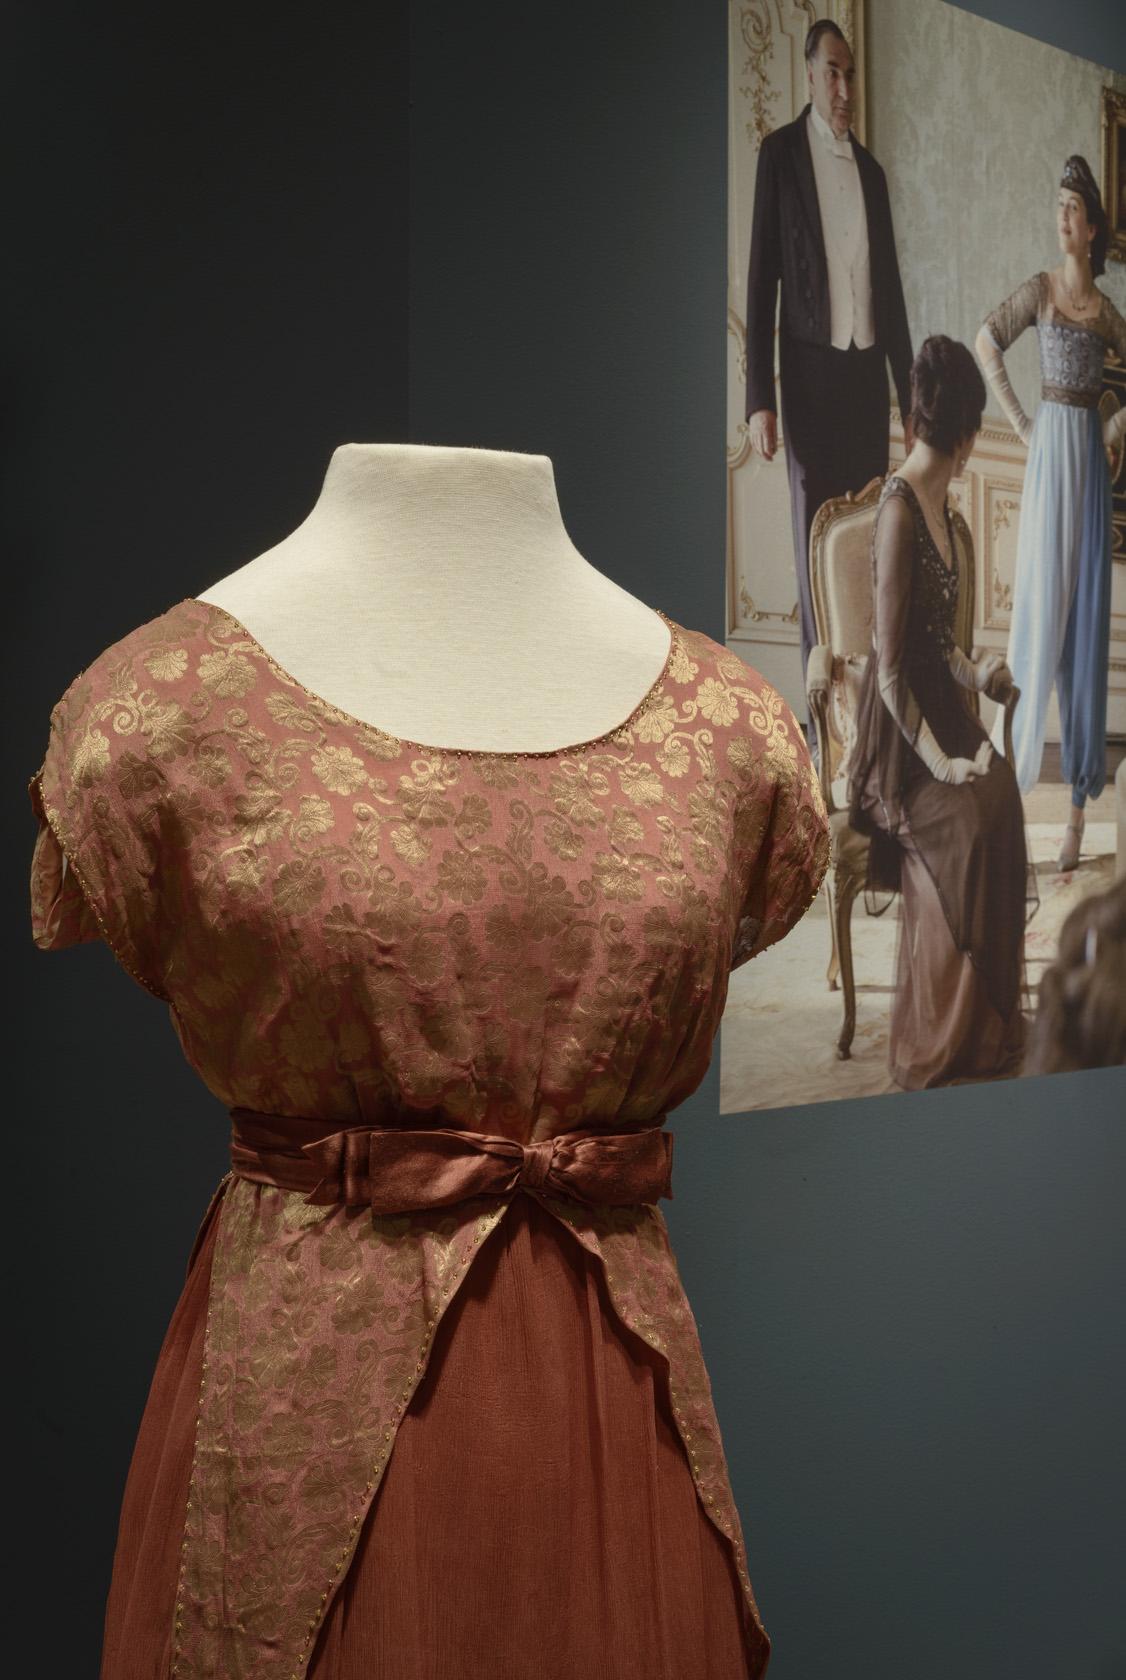 Lady Edith dress